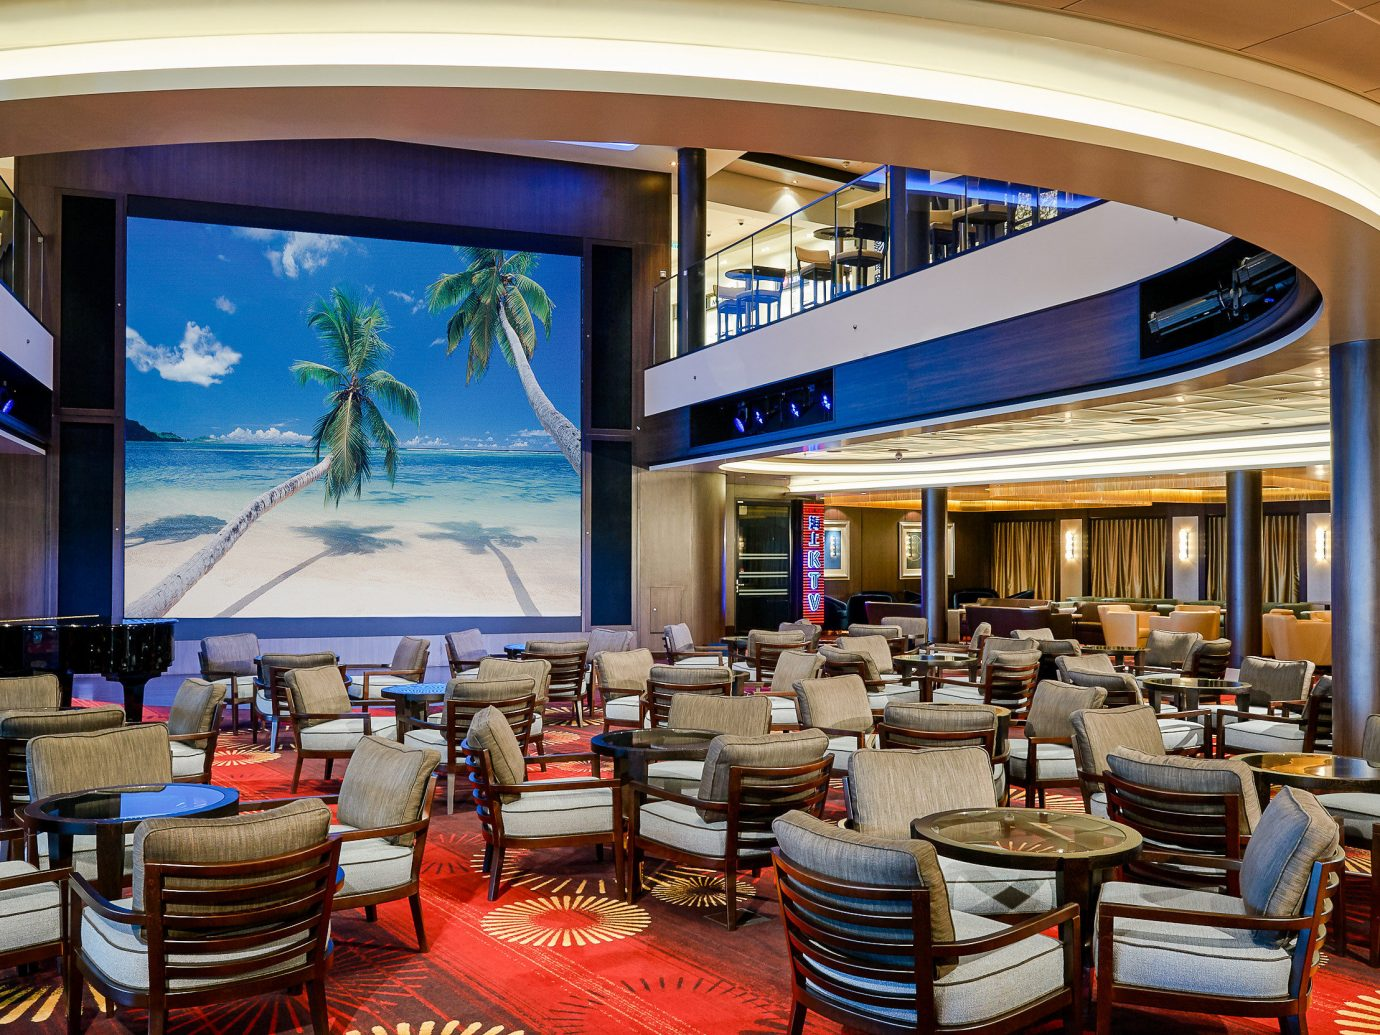 Cruise Travel Luxury Travel Trip Ideas building interior design Lobby restaurant leisure furniture